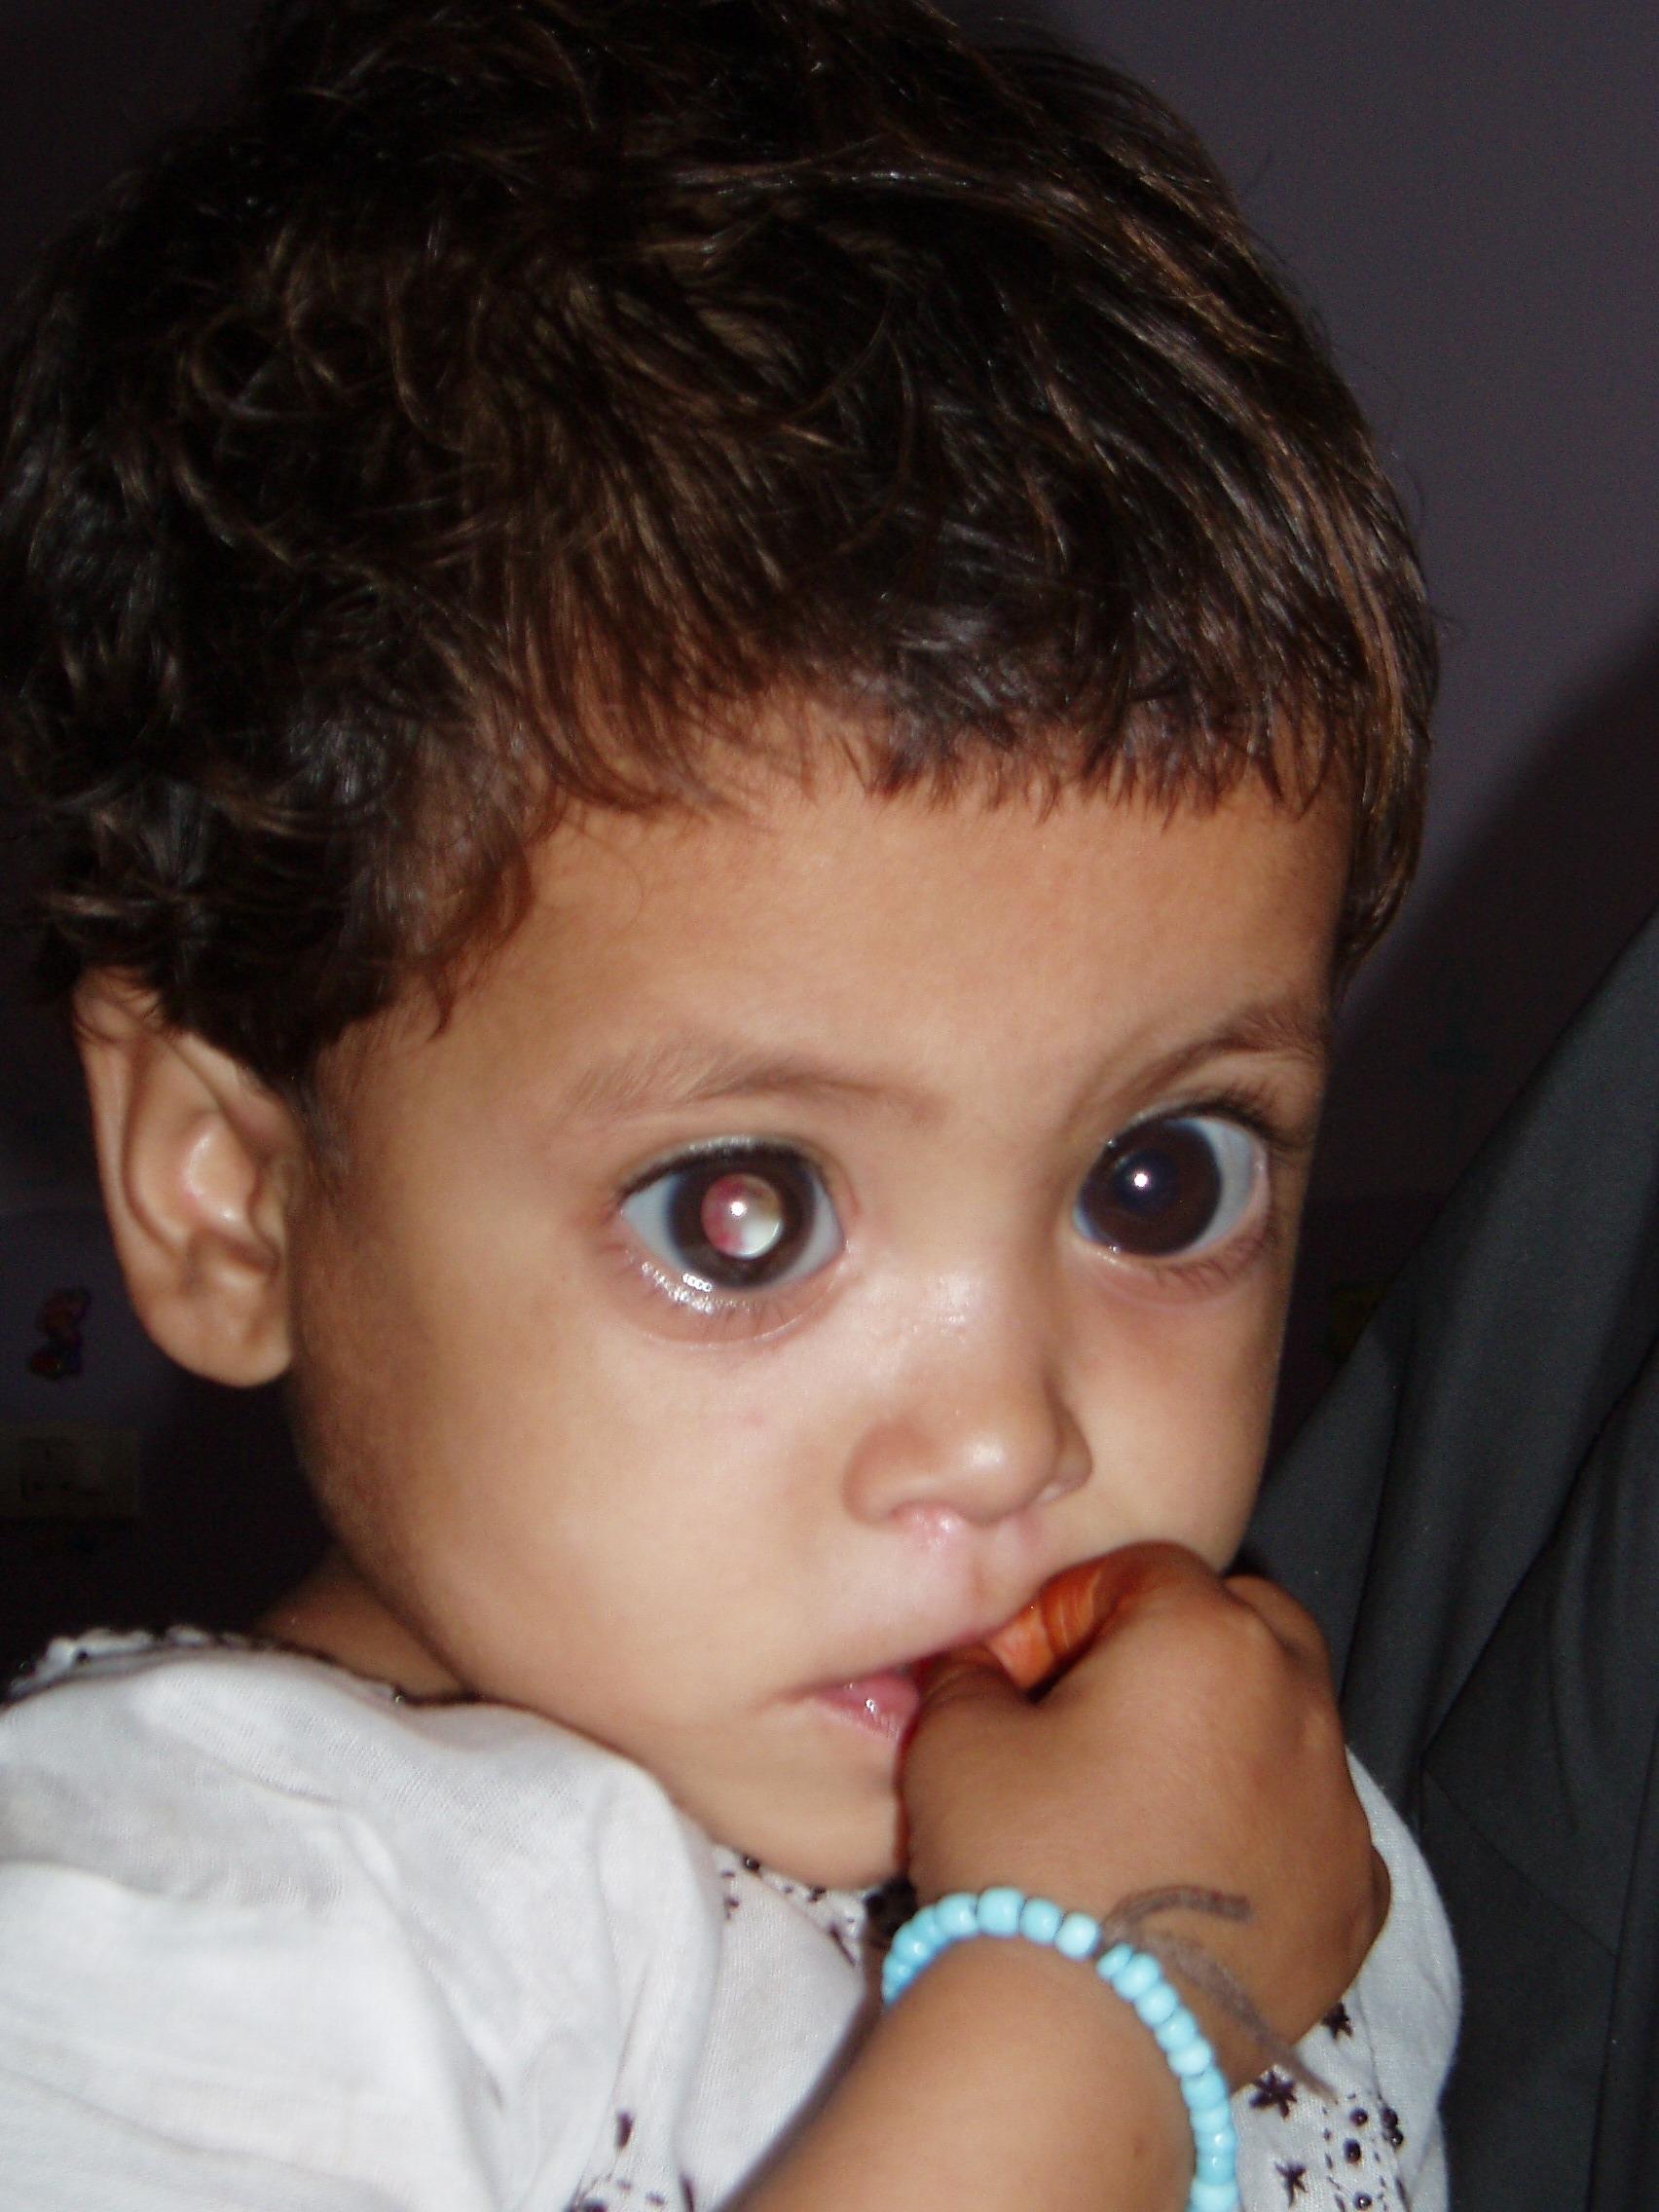 Help the poor blind children in Pakistan See! - GlobalGiving